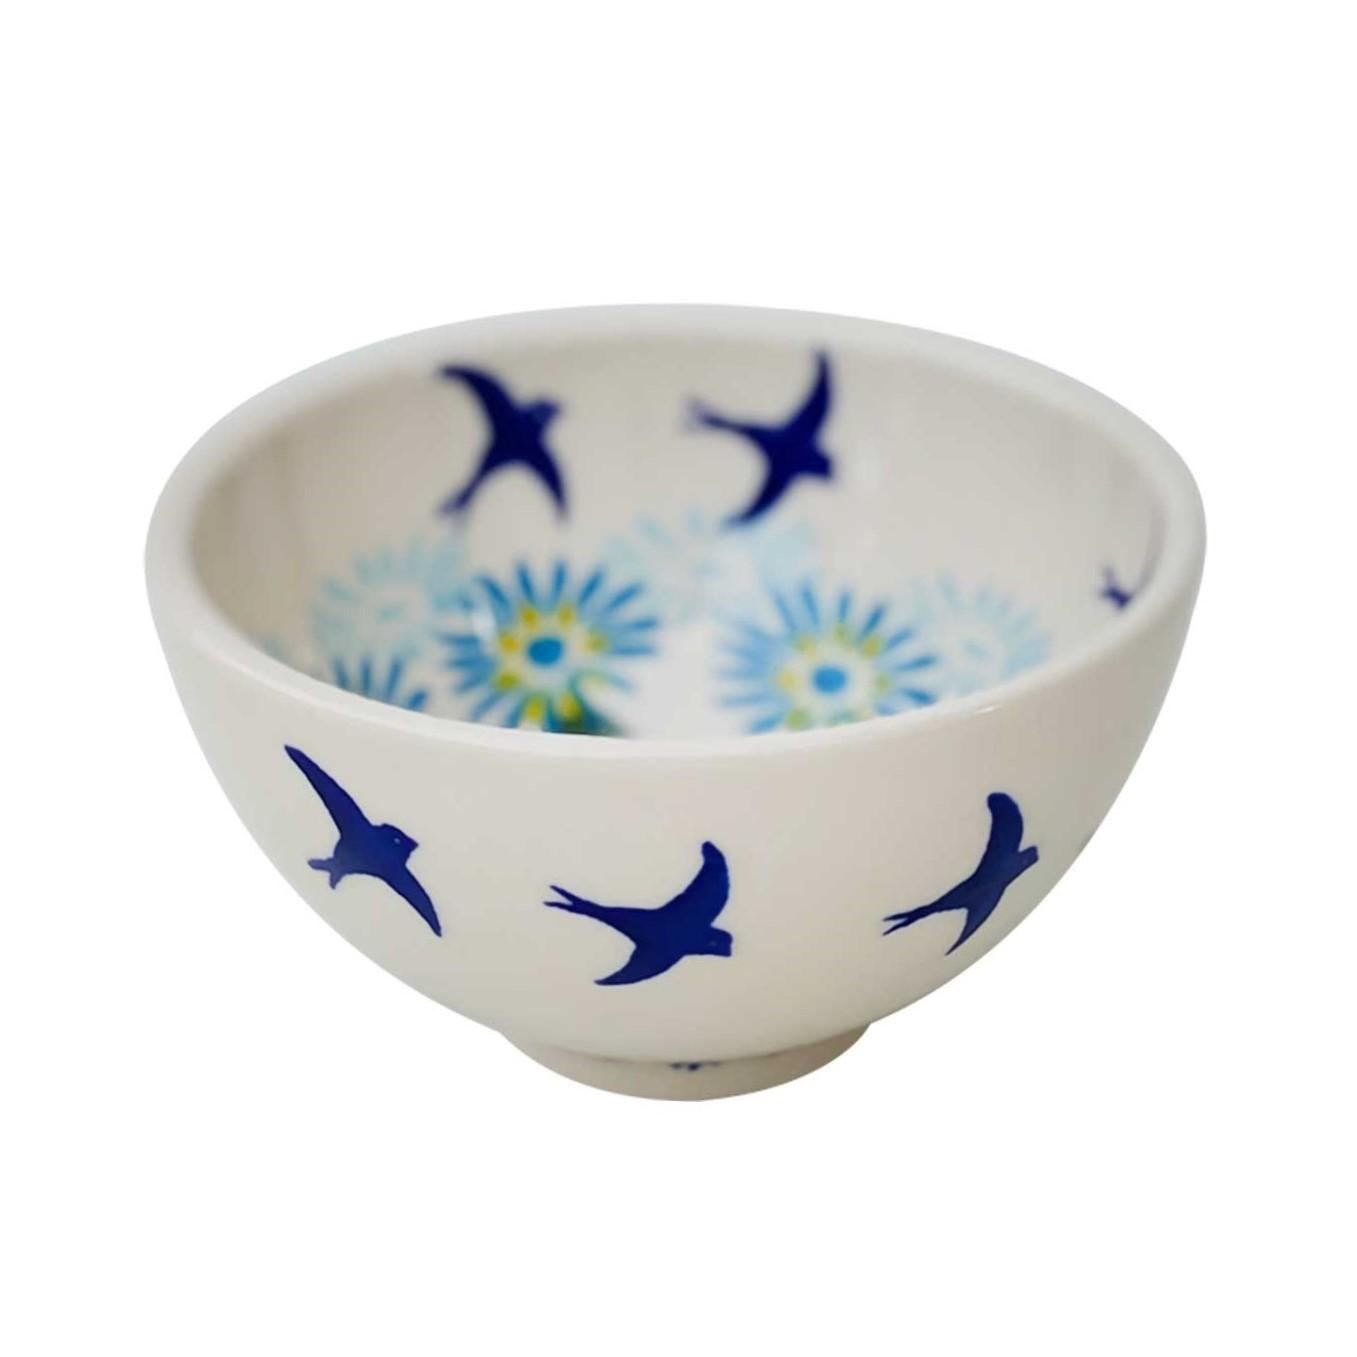 Pottery Avenue Vena 5-oz Stoneware Rice Bowl - V474-C093 SOARING